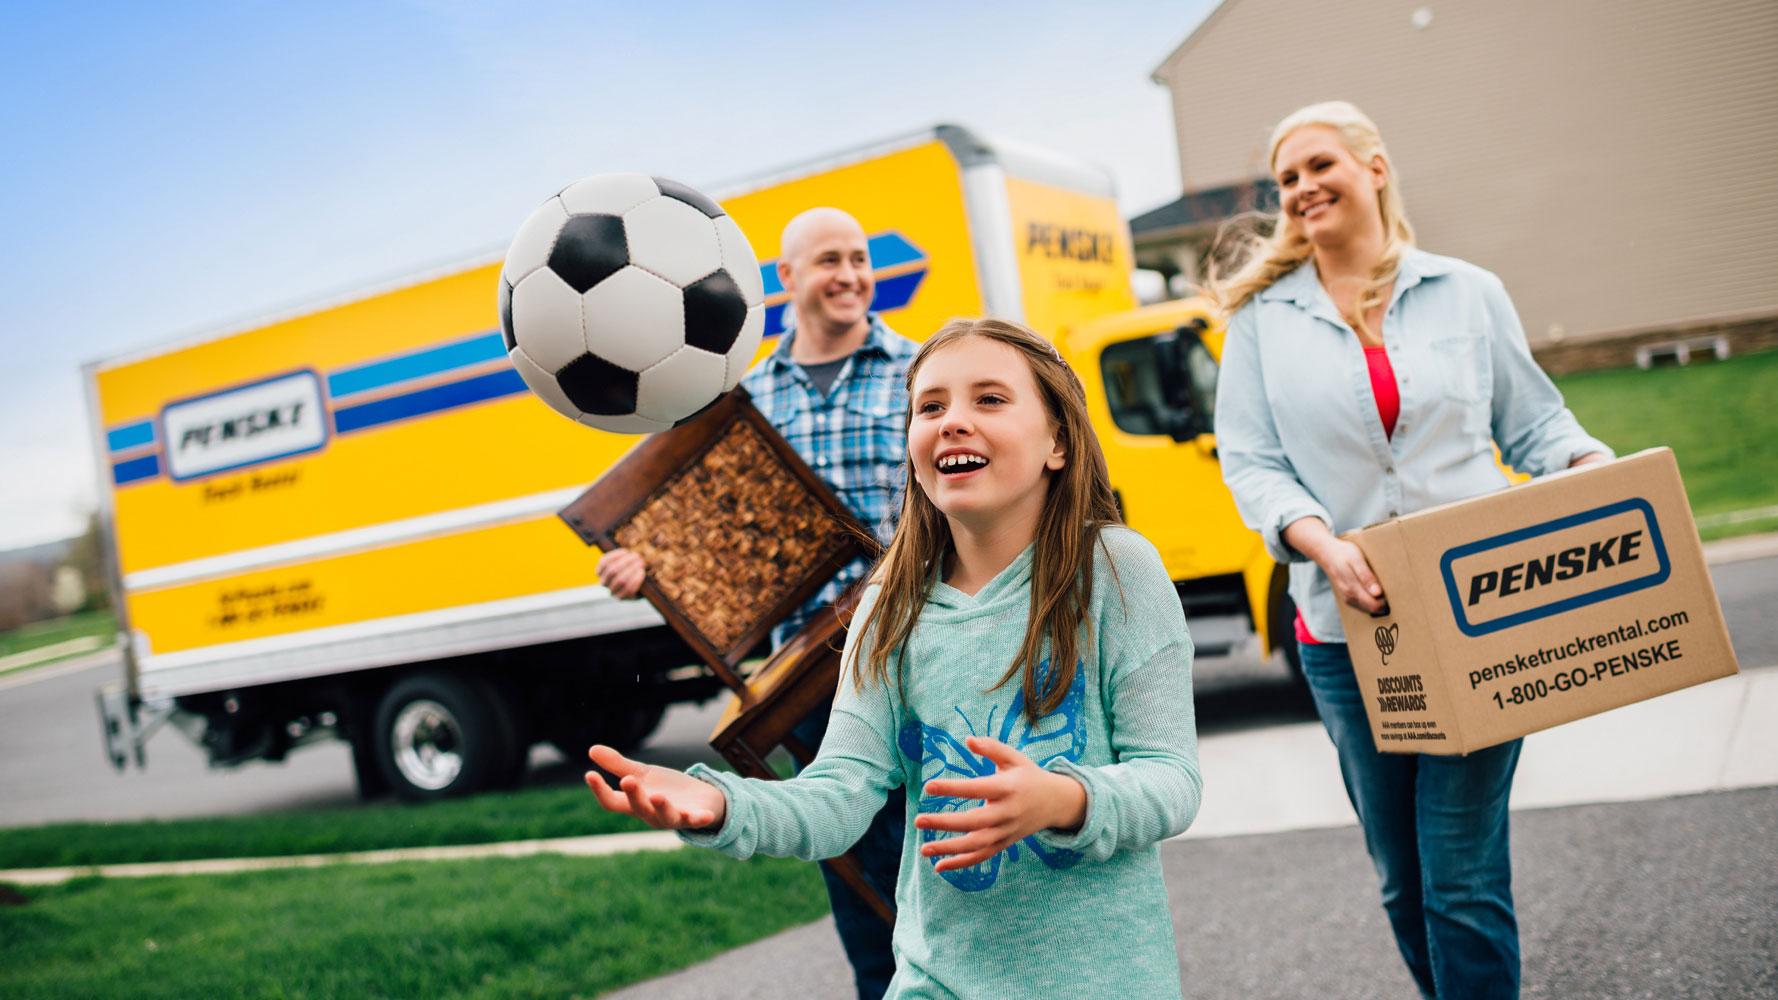 Penske Truck Rental 148 Storage Pl Blairsville Ga 30512 Sp Com